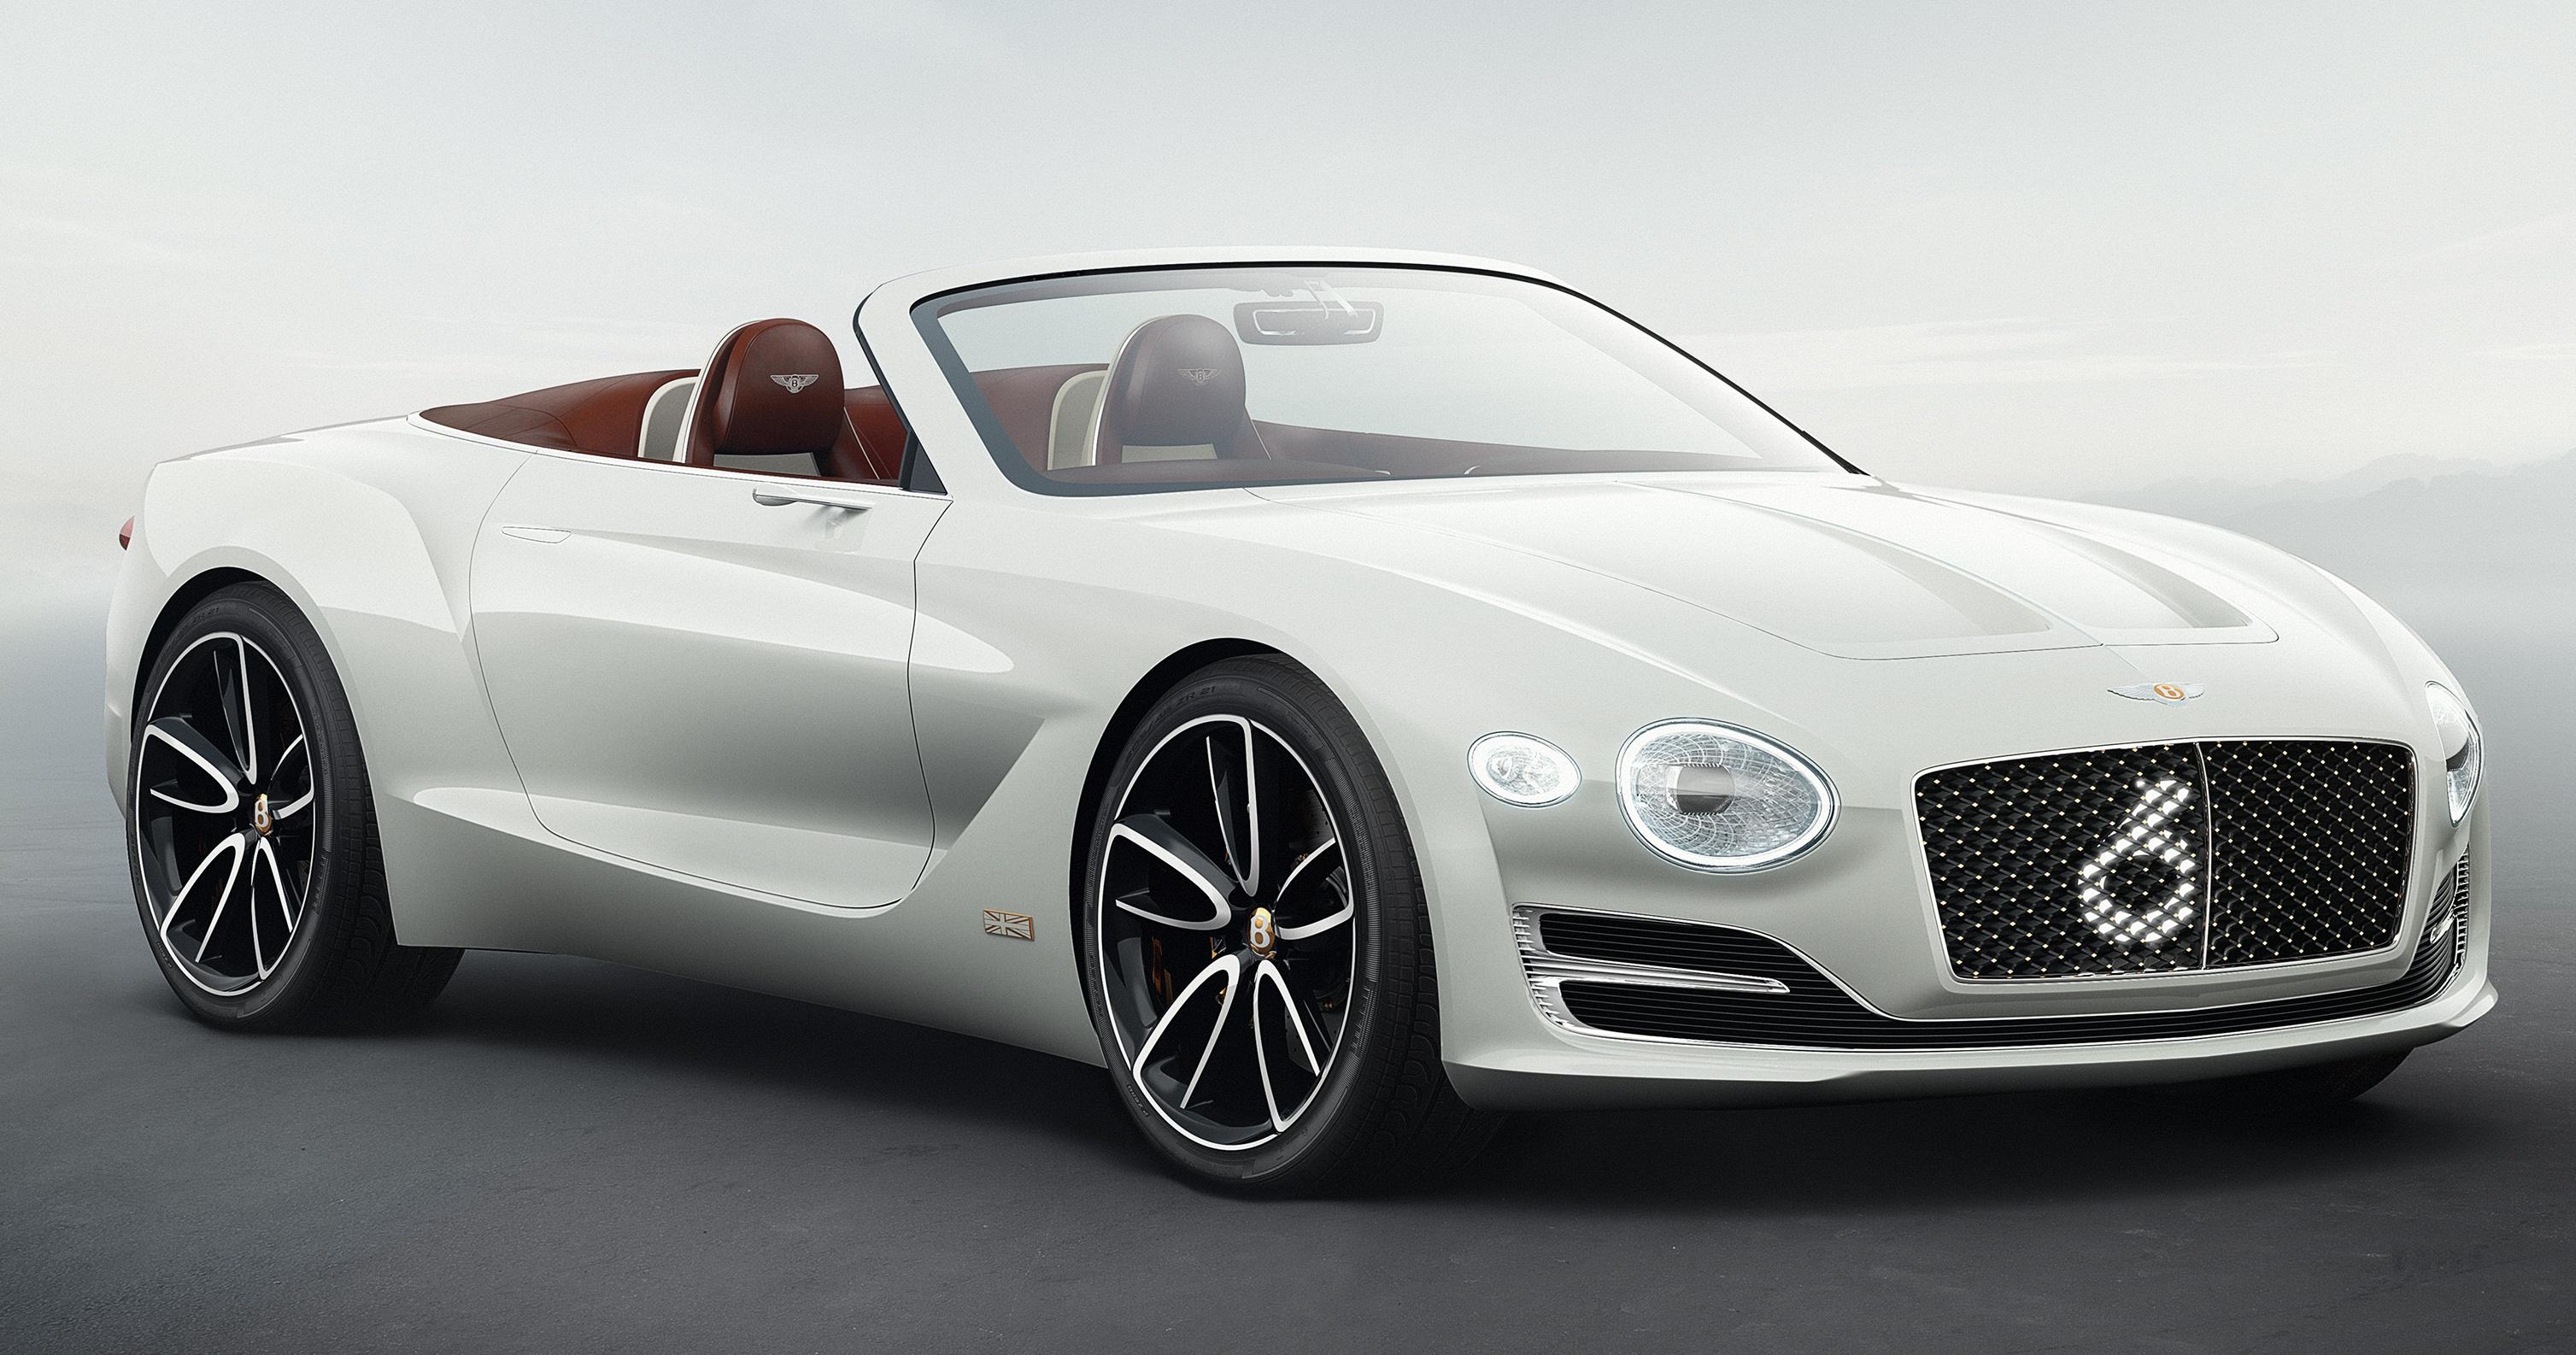 Bentley Exp 12 Speed 6e Luxury Electric Vehicle Image 626950